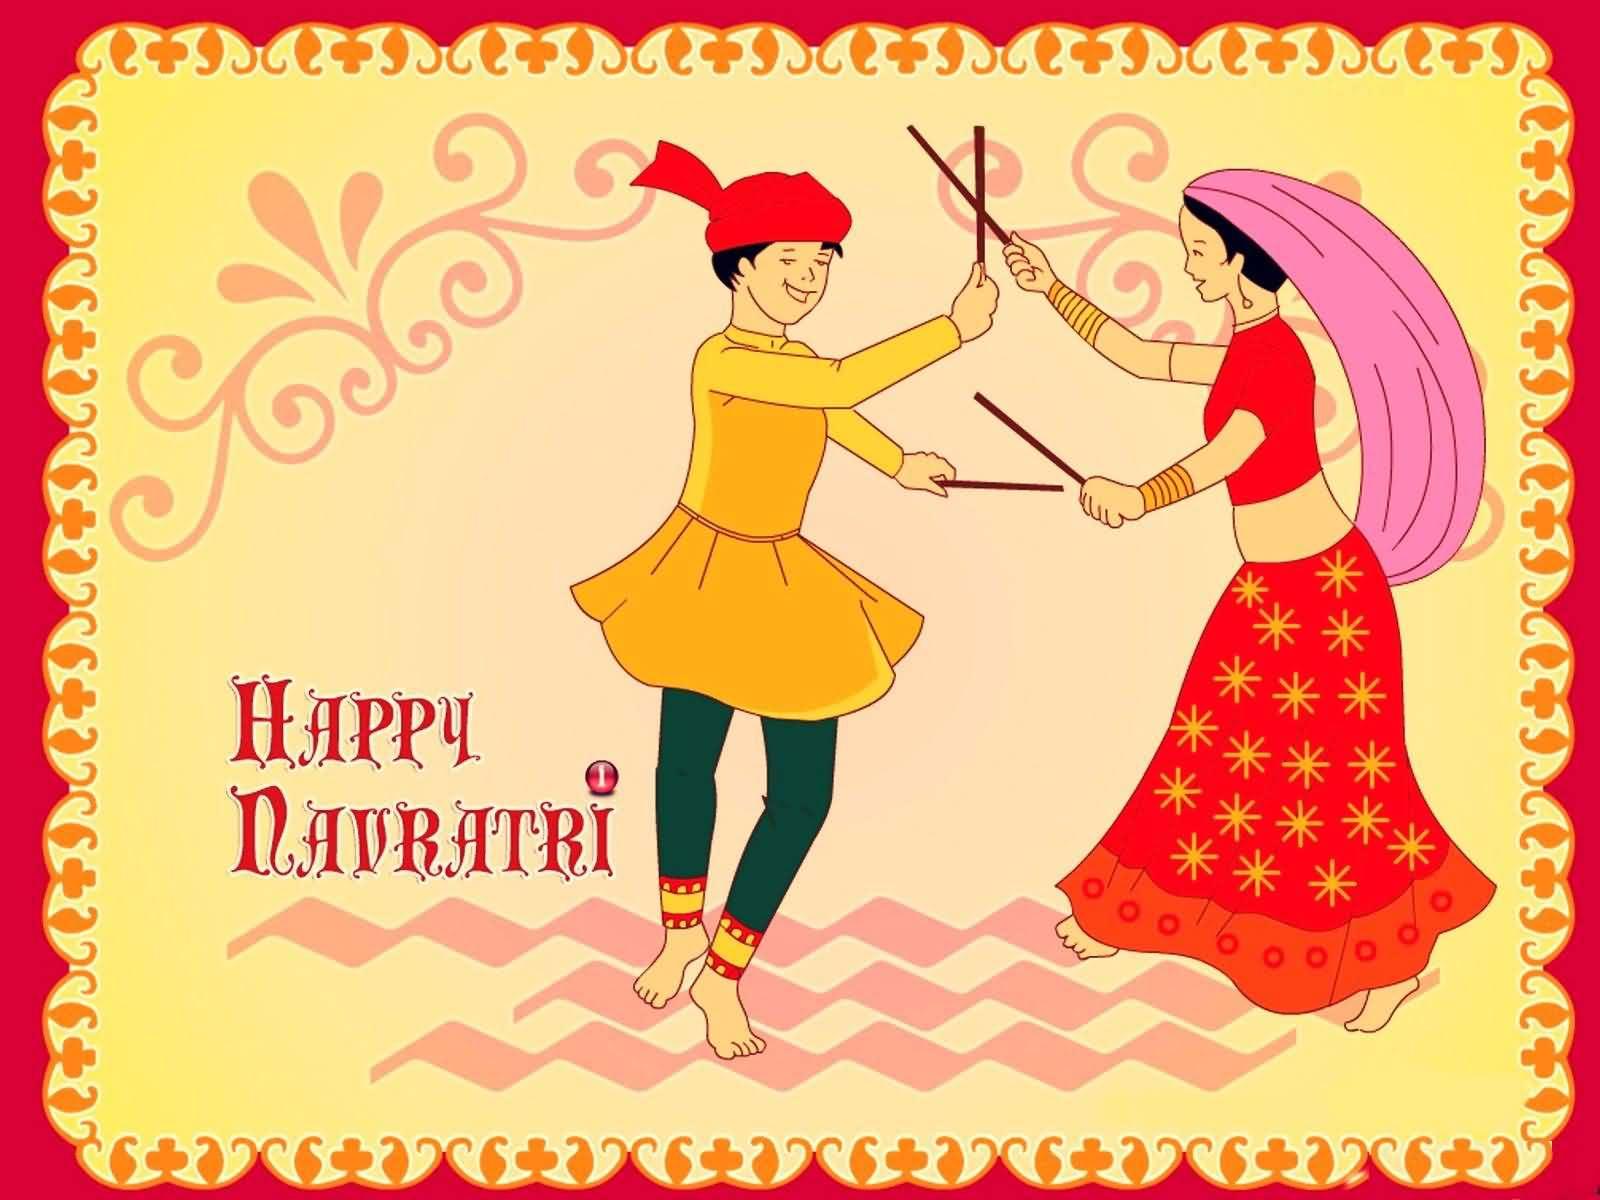 happy navratri couple playing dandiya illustration